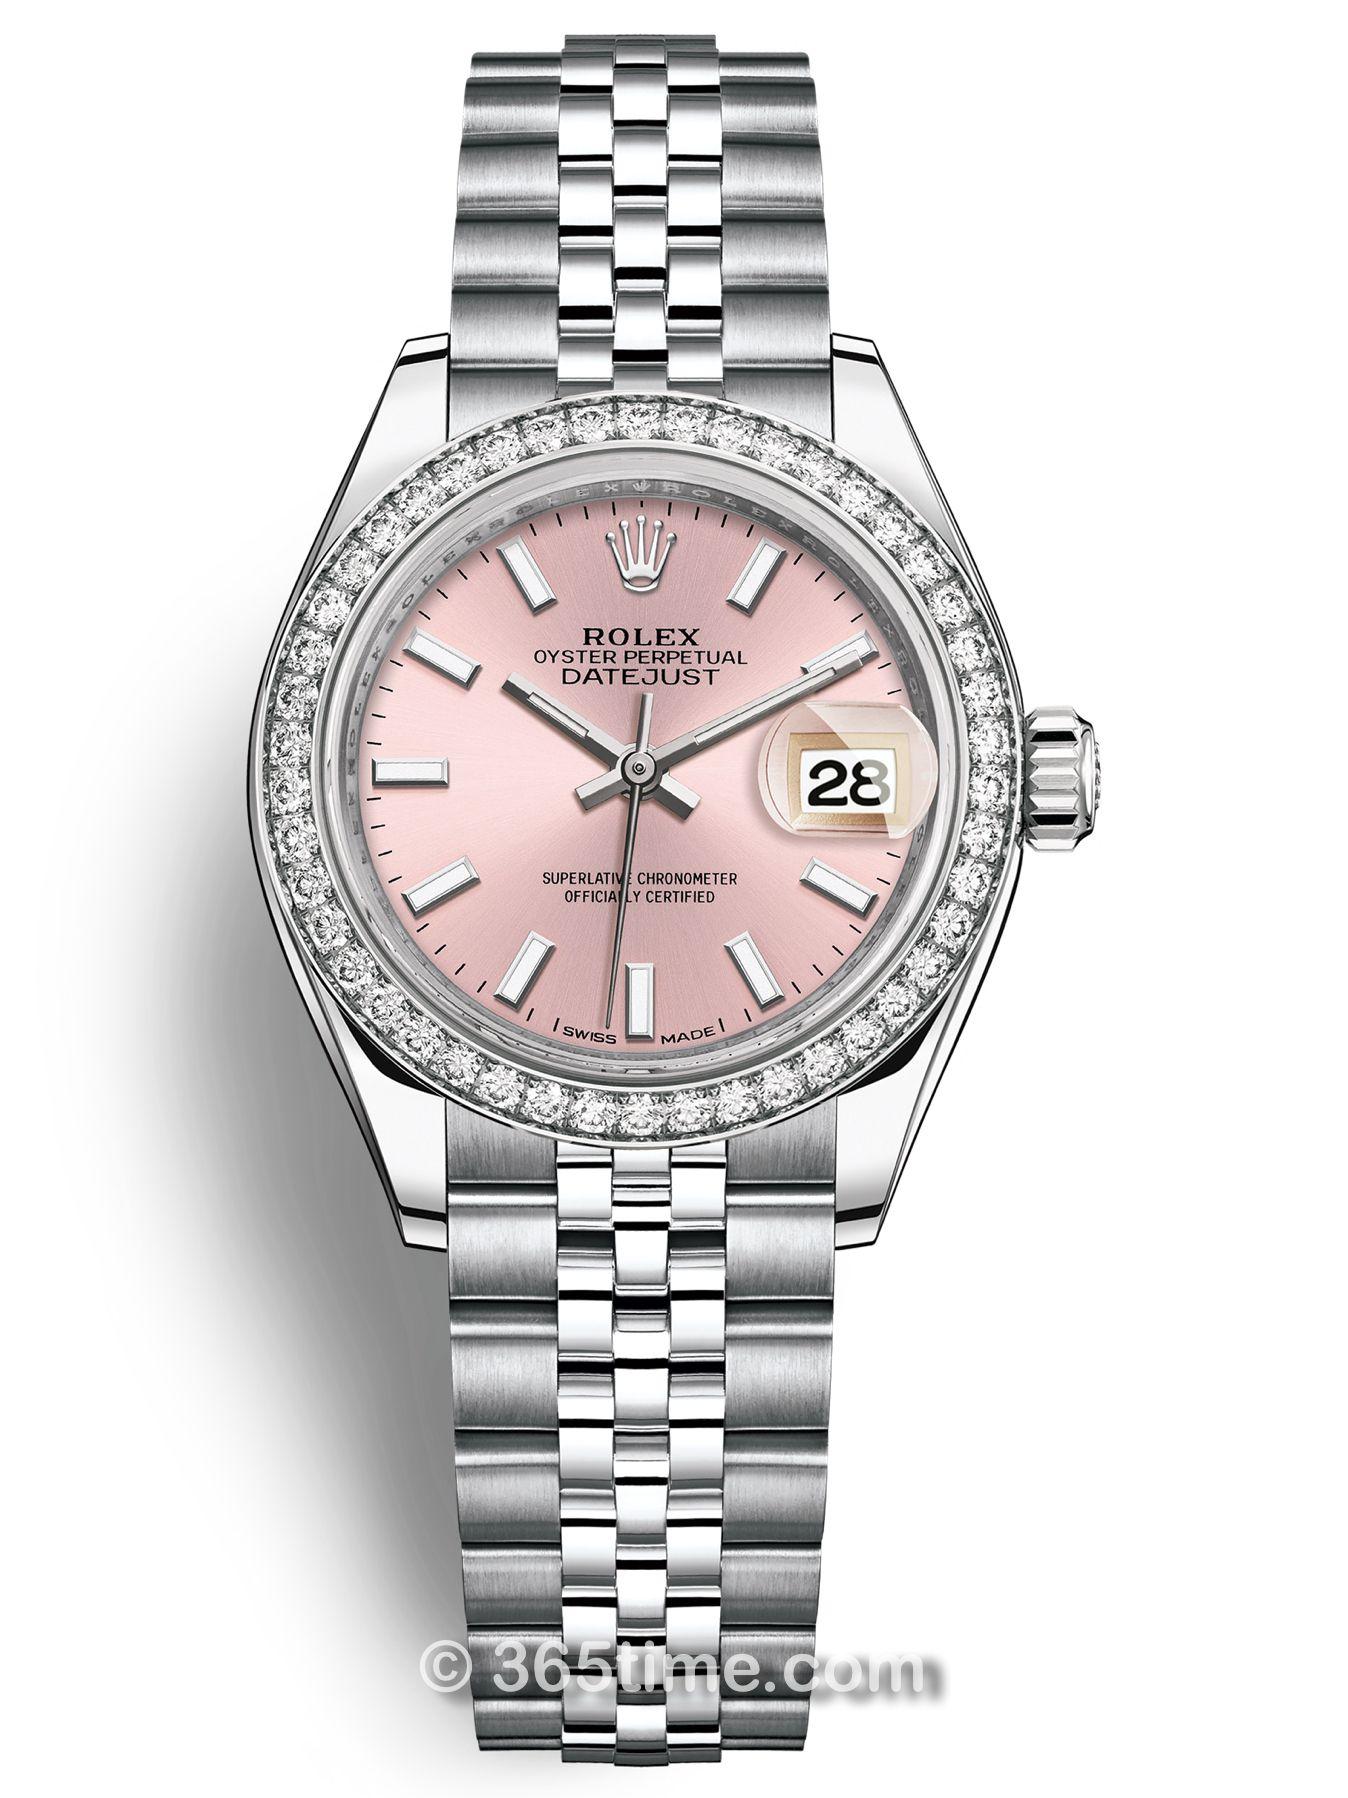 Rolex劳力士女装日志型28白金镶钻手表279384rbr-0001